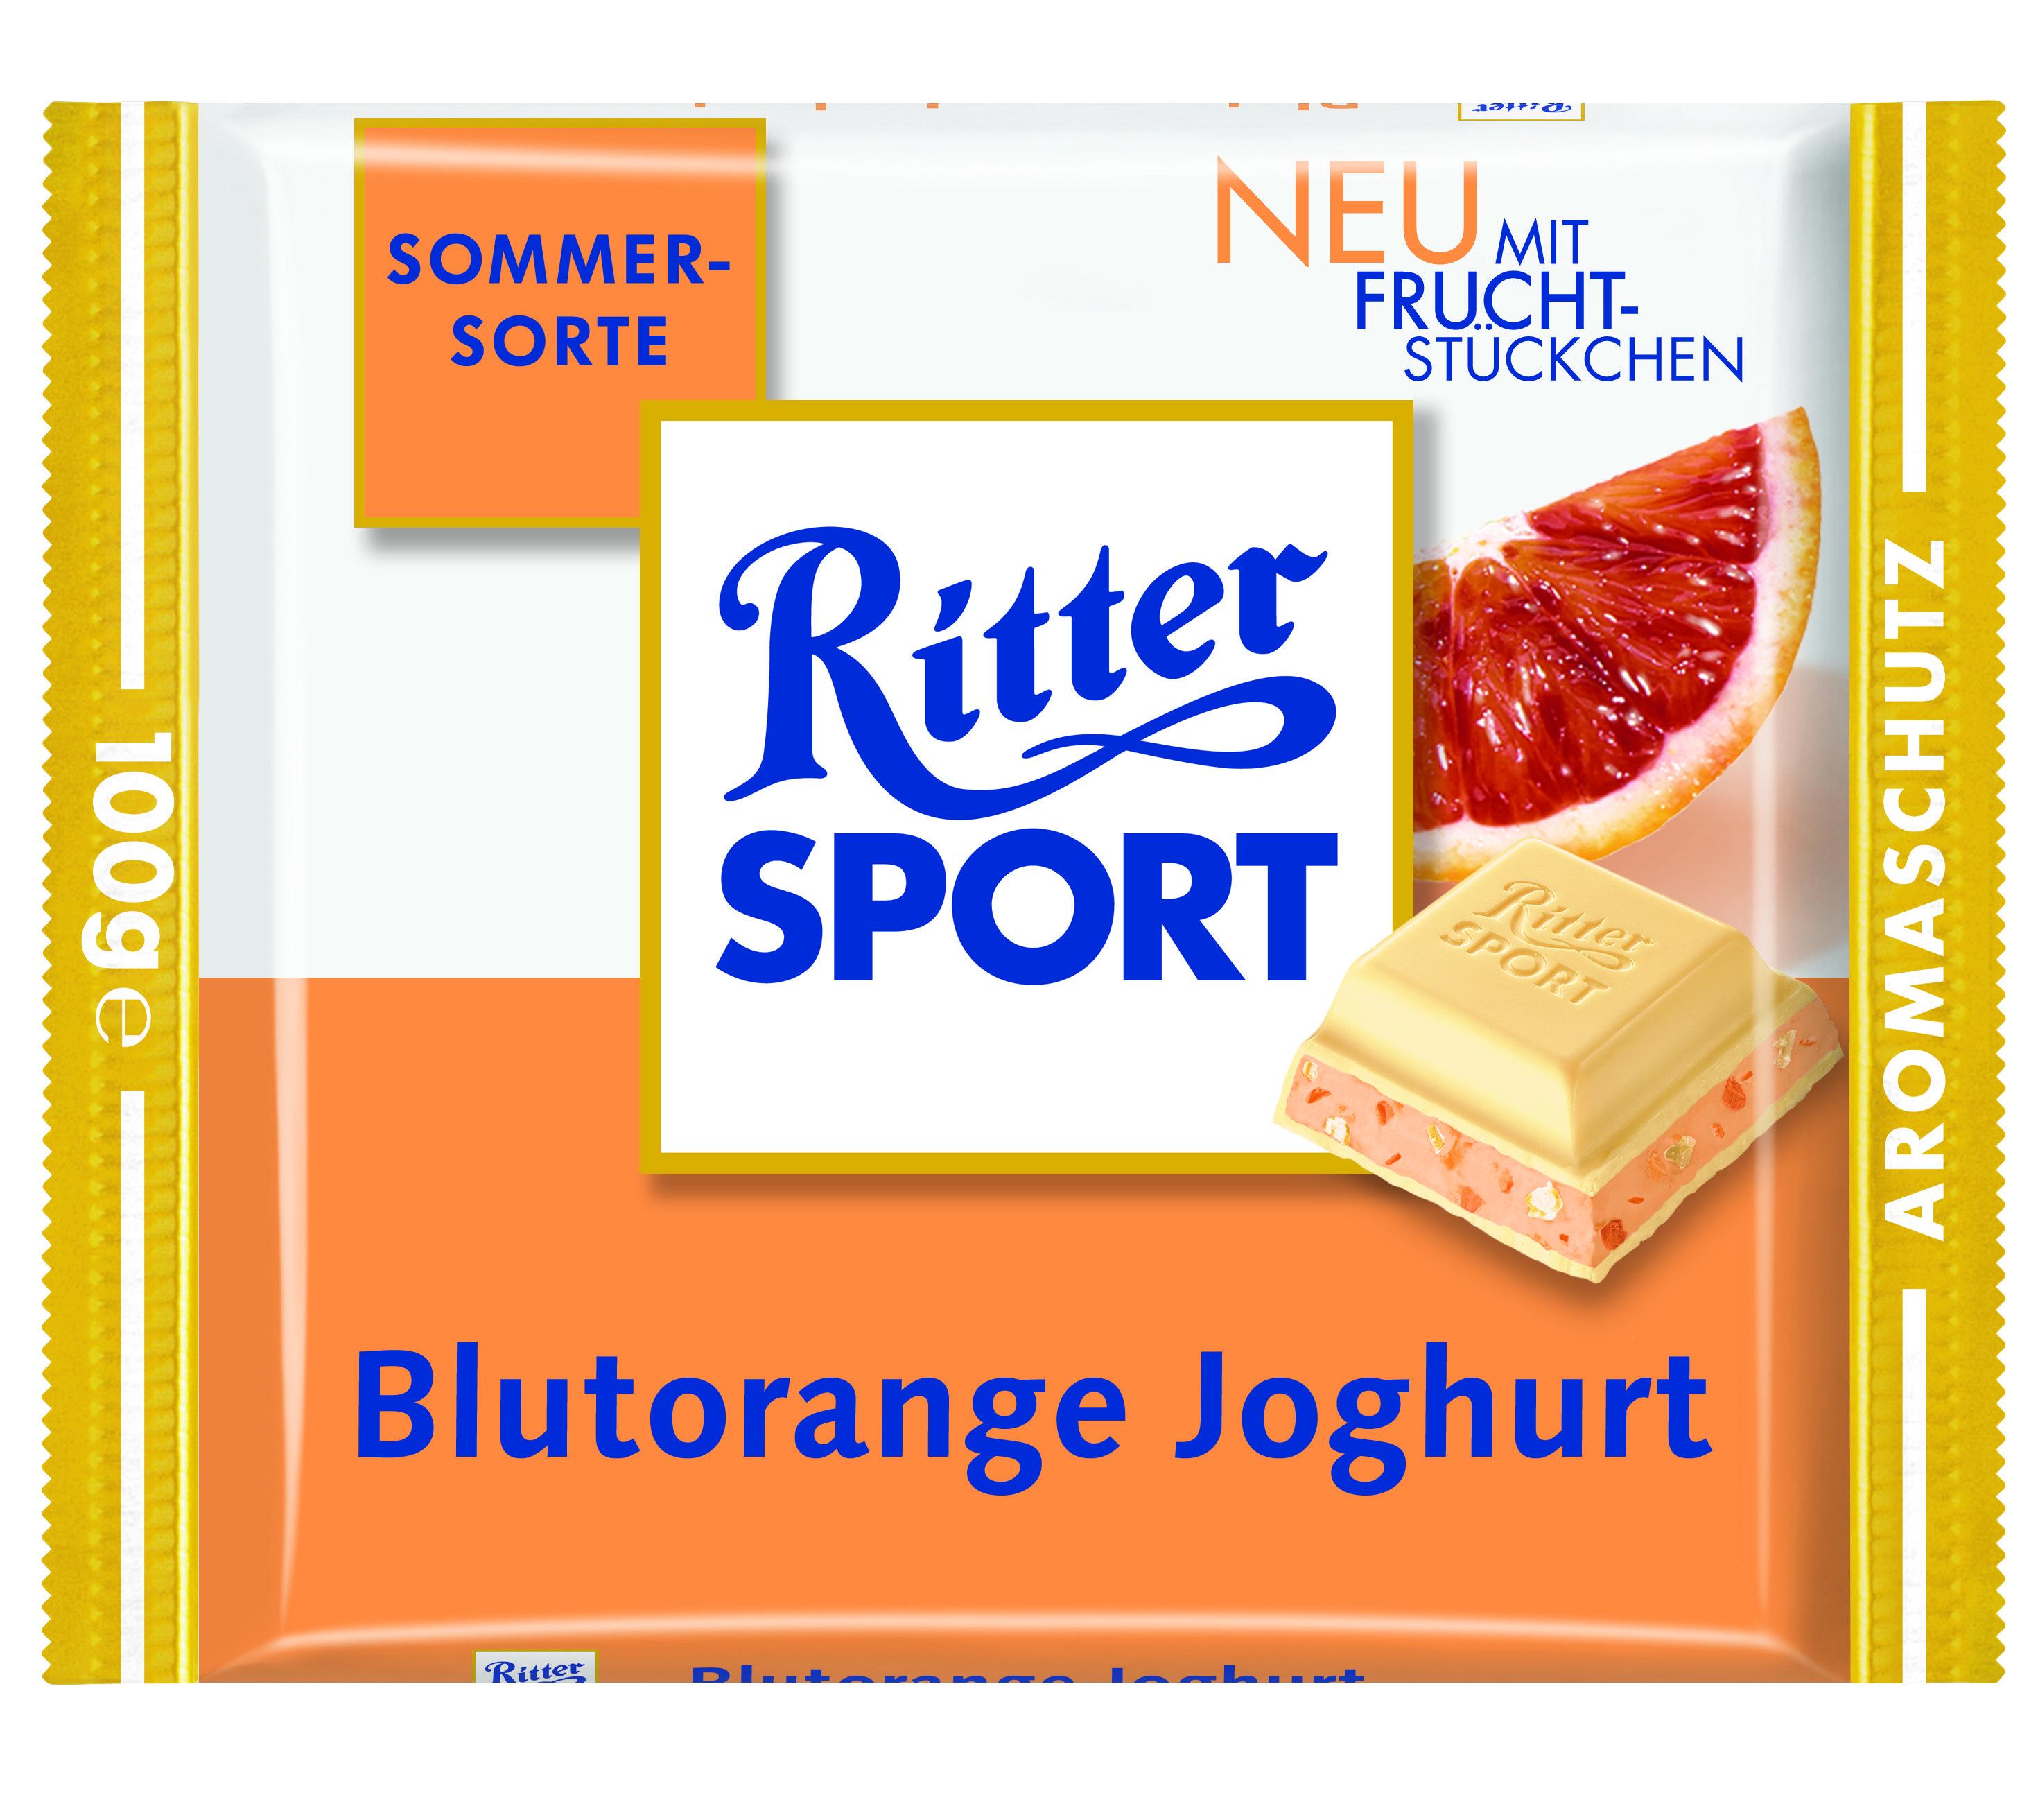 RITTER SPORT Blutorange Joghurt (2007)